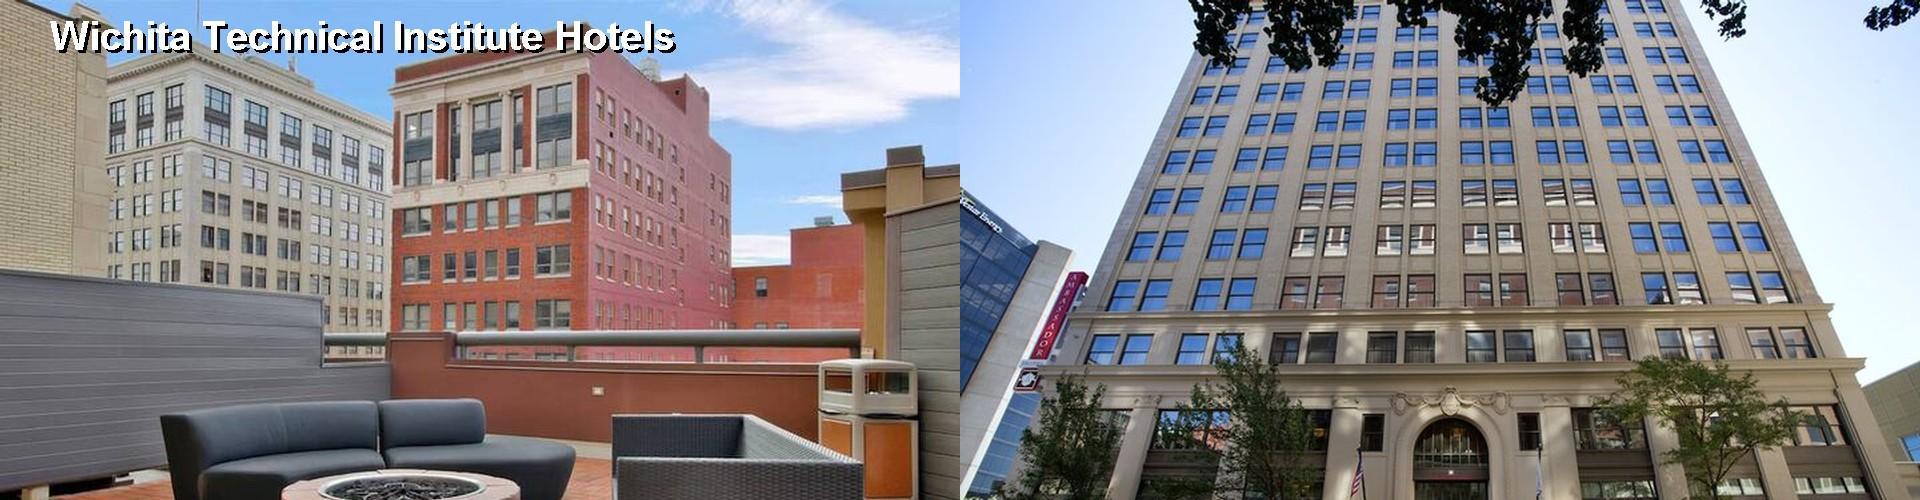 41 Hotels Near Wichita Technical Insute Ks